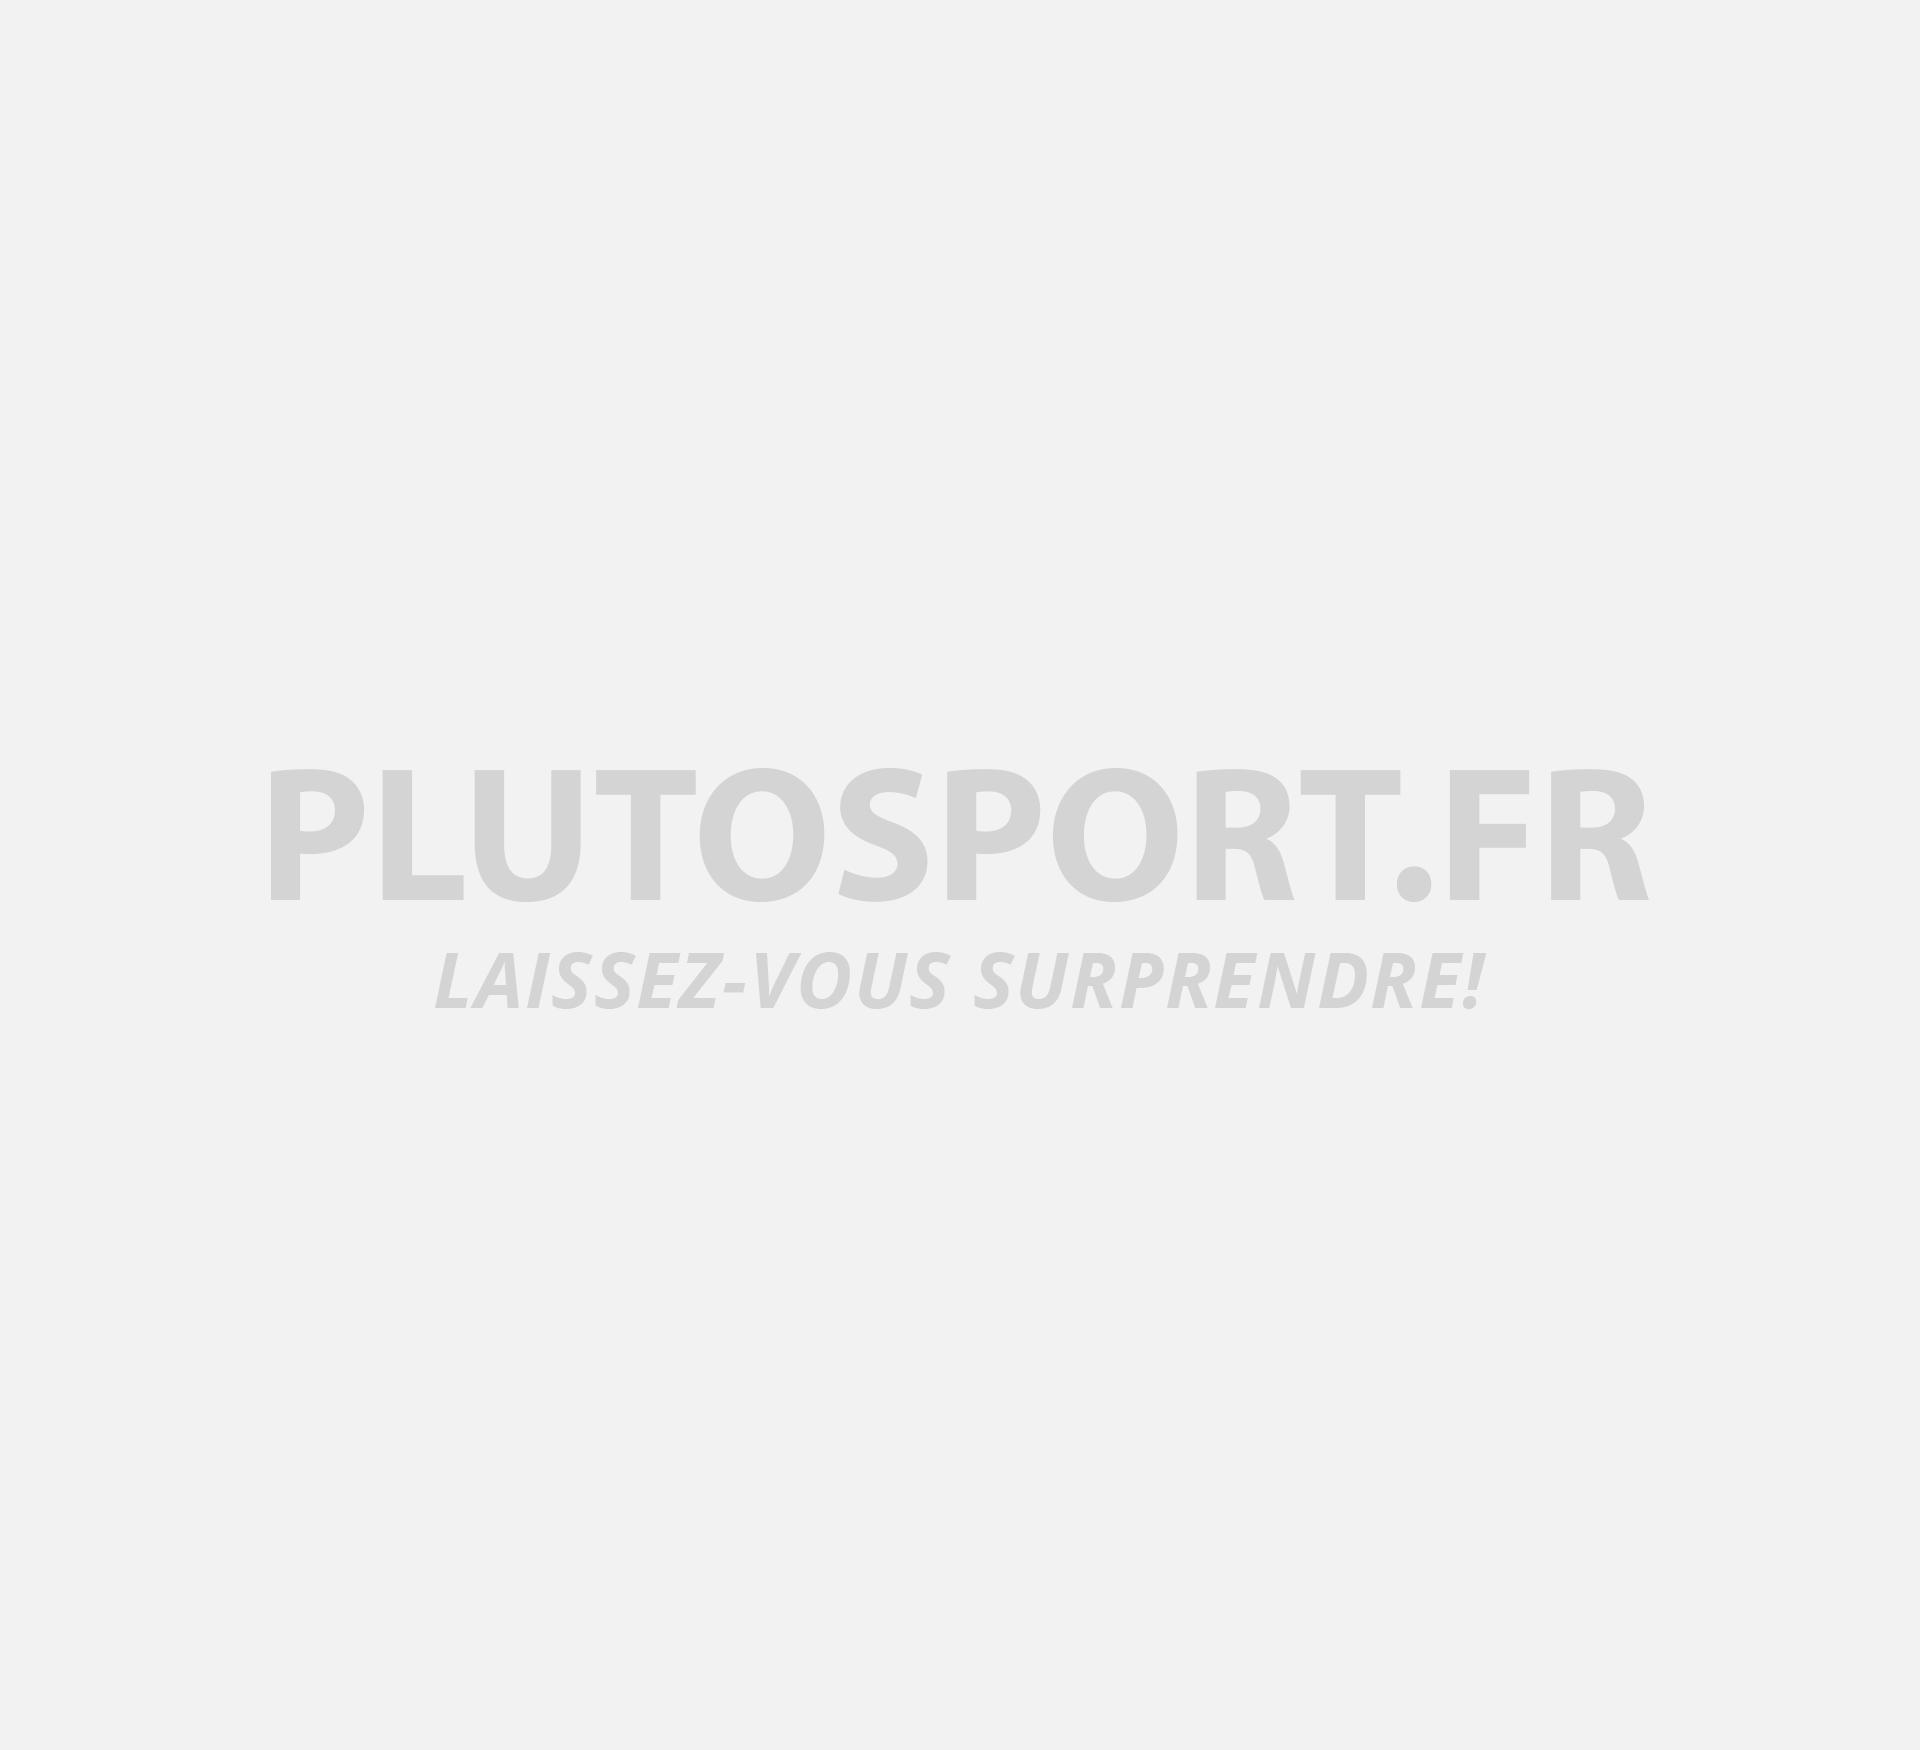 Brooks Chaussures Sportsplutosport 16 Neutre Glycerin Running Wqrdxboece CodBxre